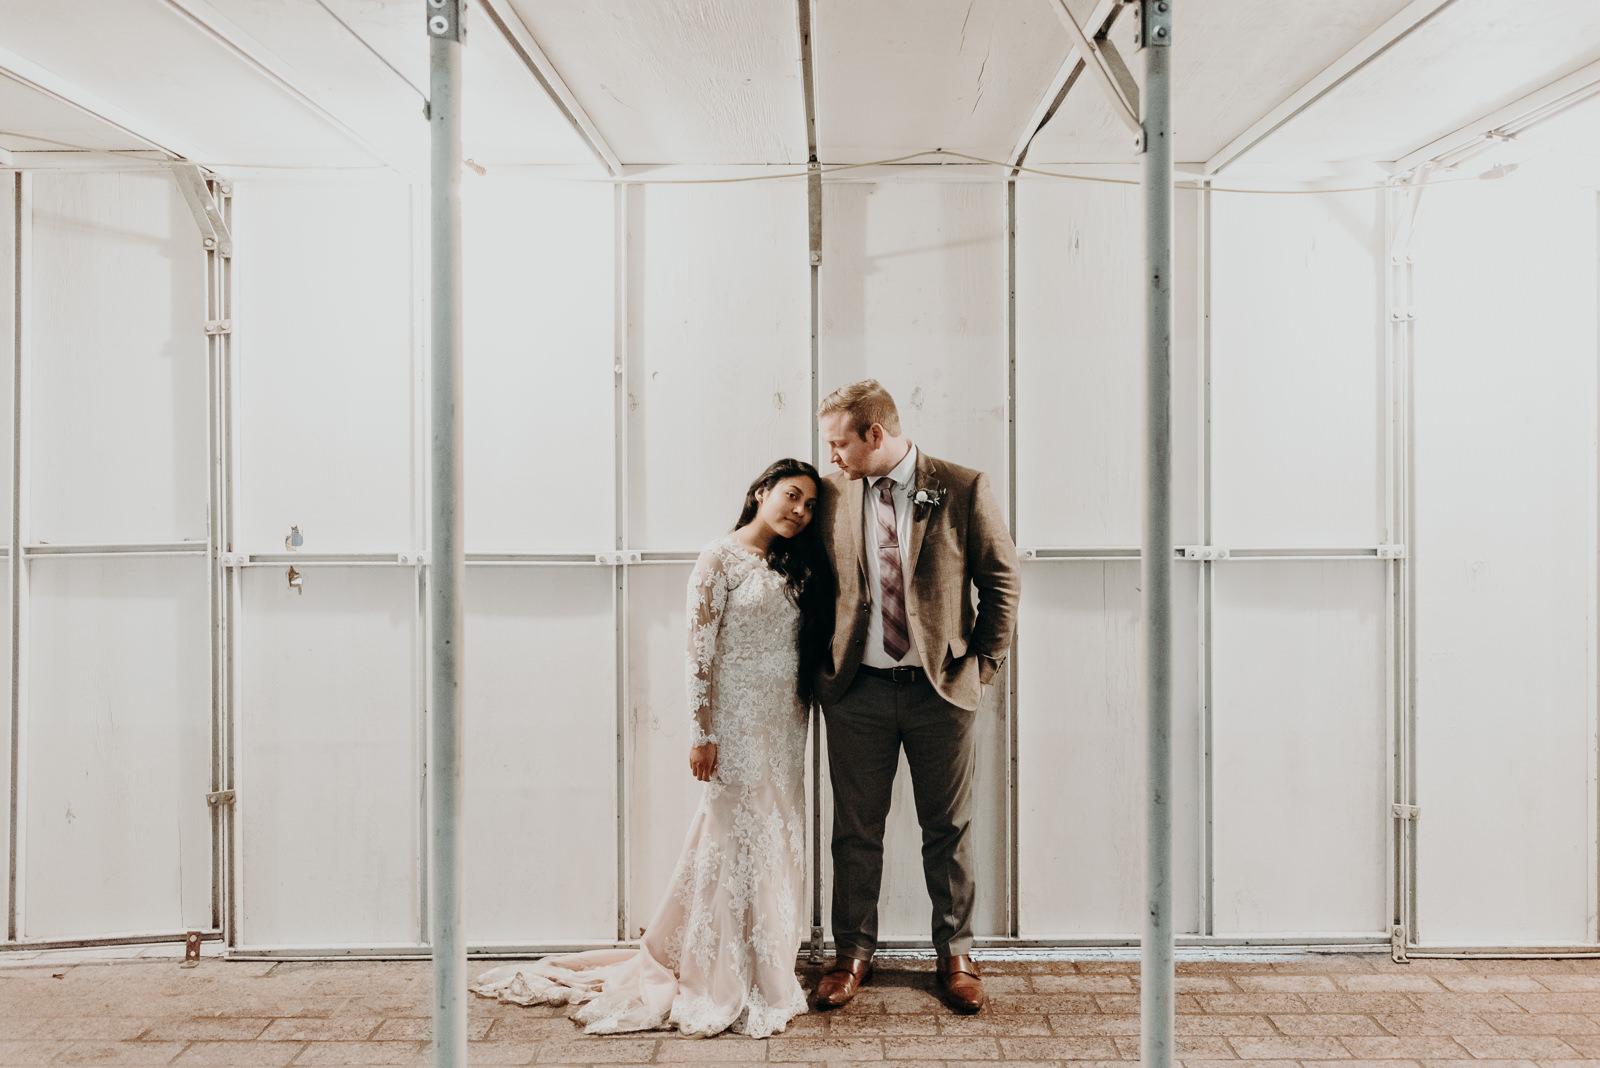 night wedding portraits in downtown austin texas